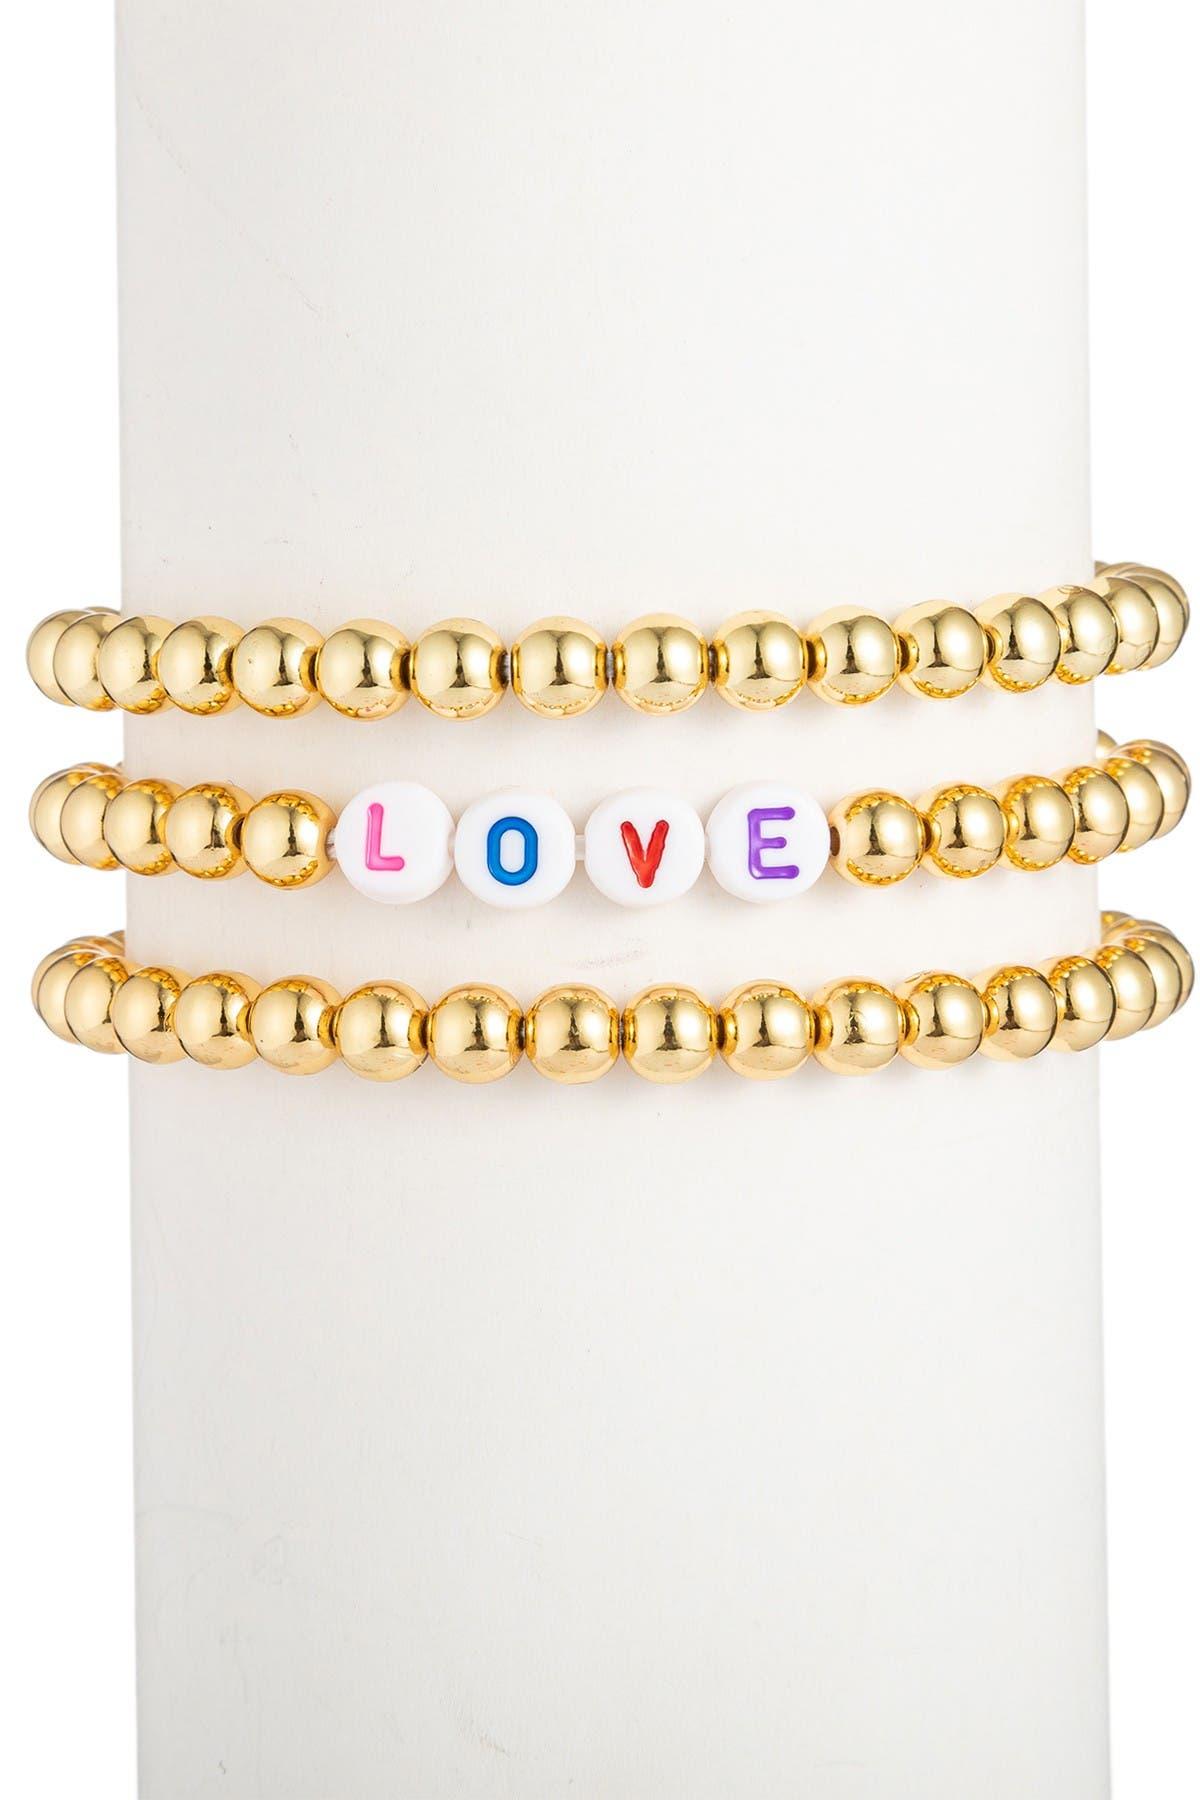 Image of Eye Candy Los Angeles Love Titanium Beaded Bracelet Set